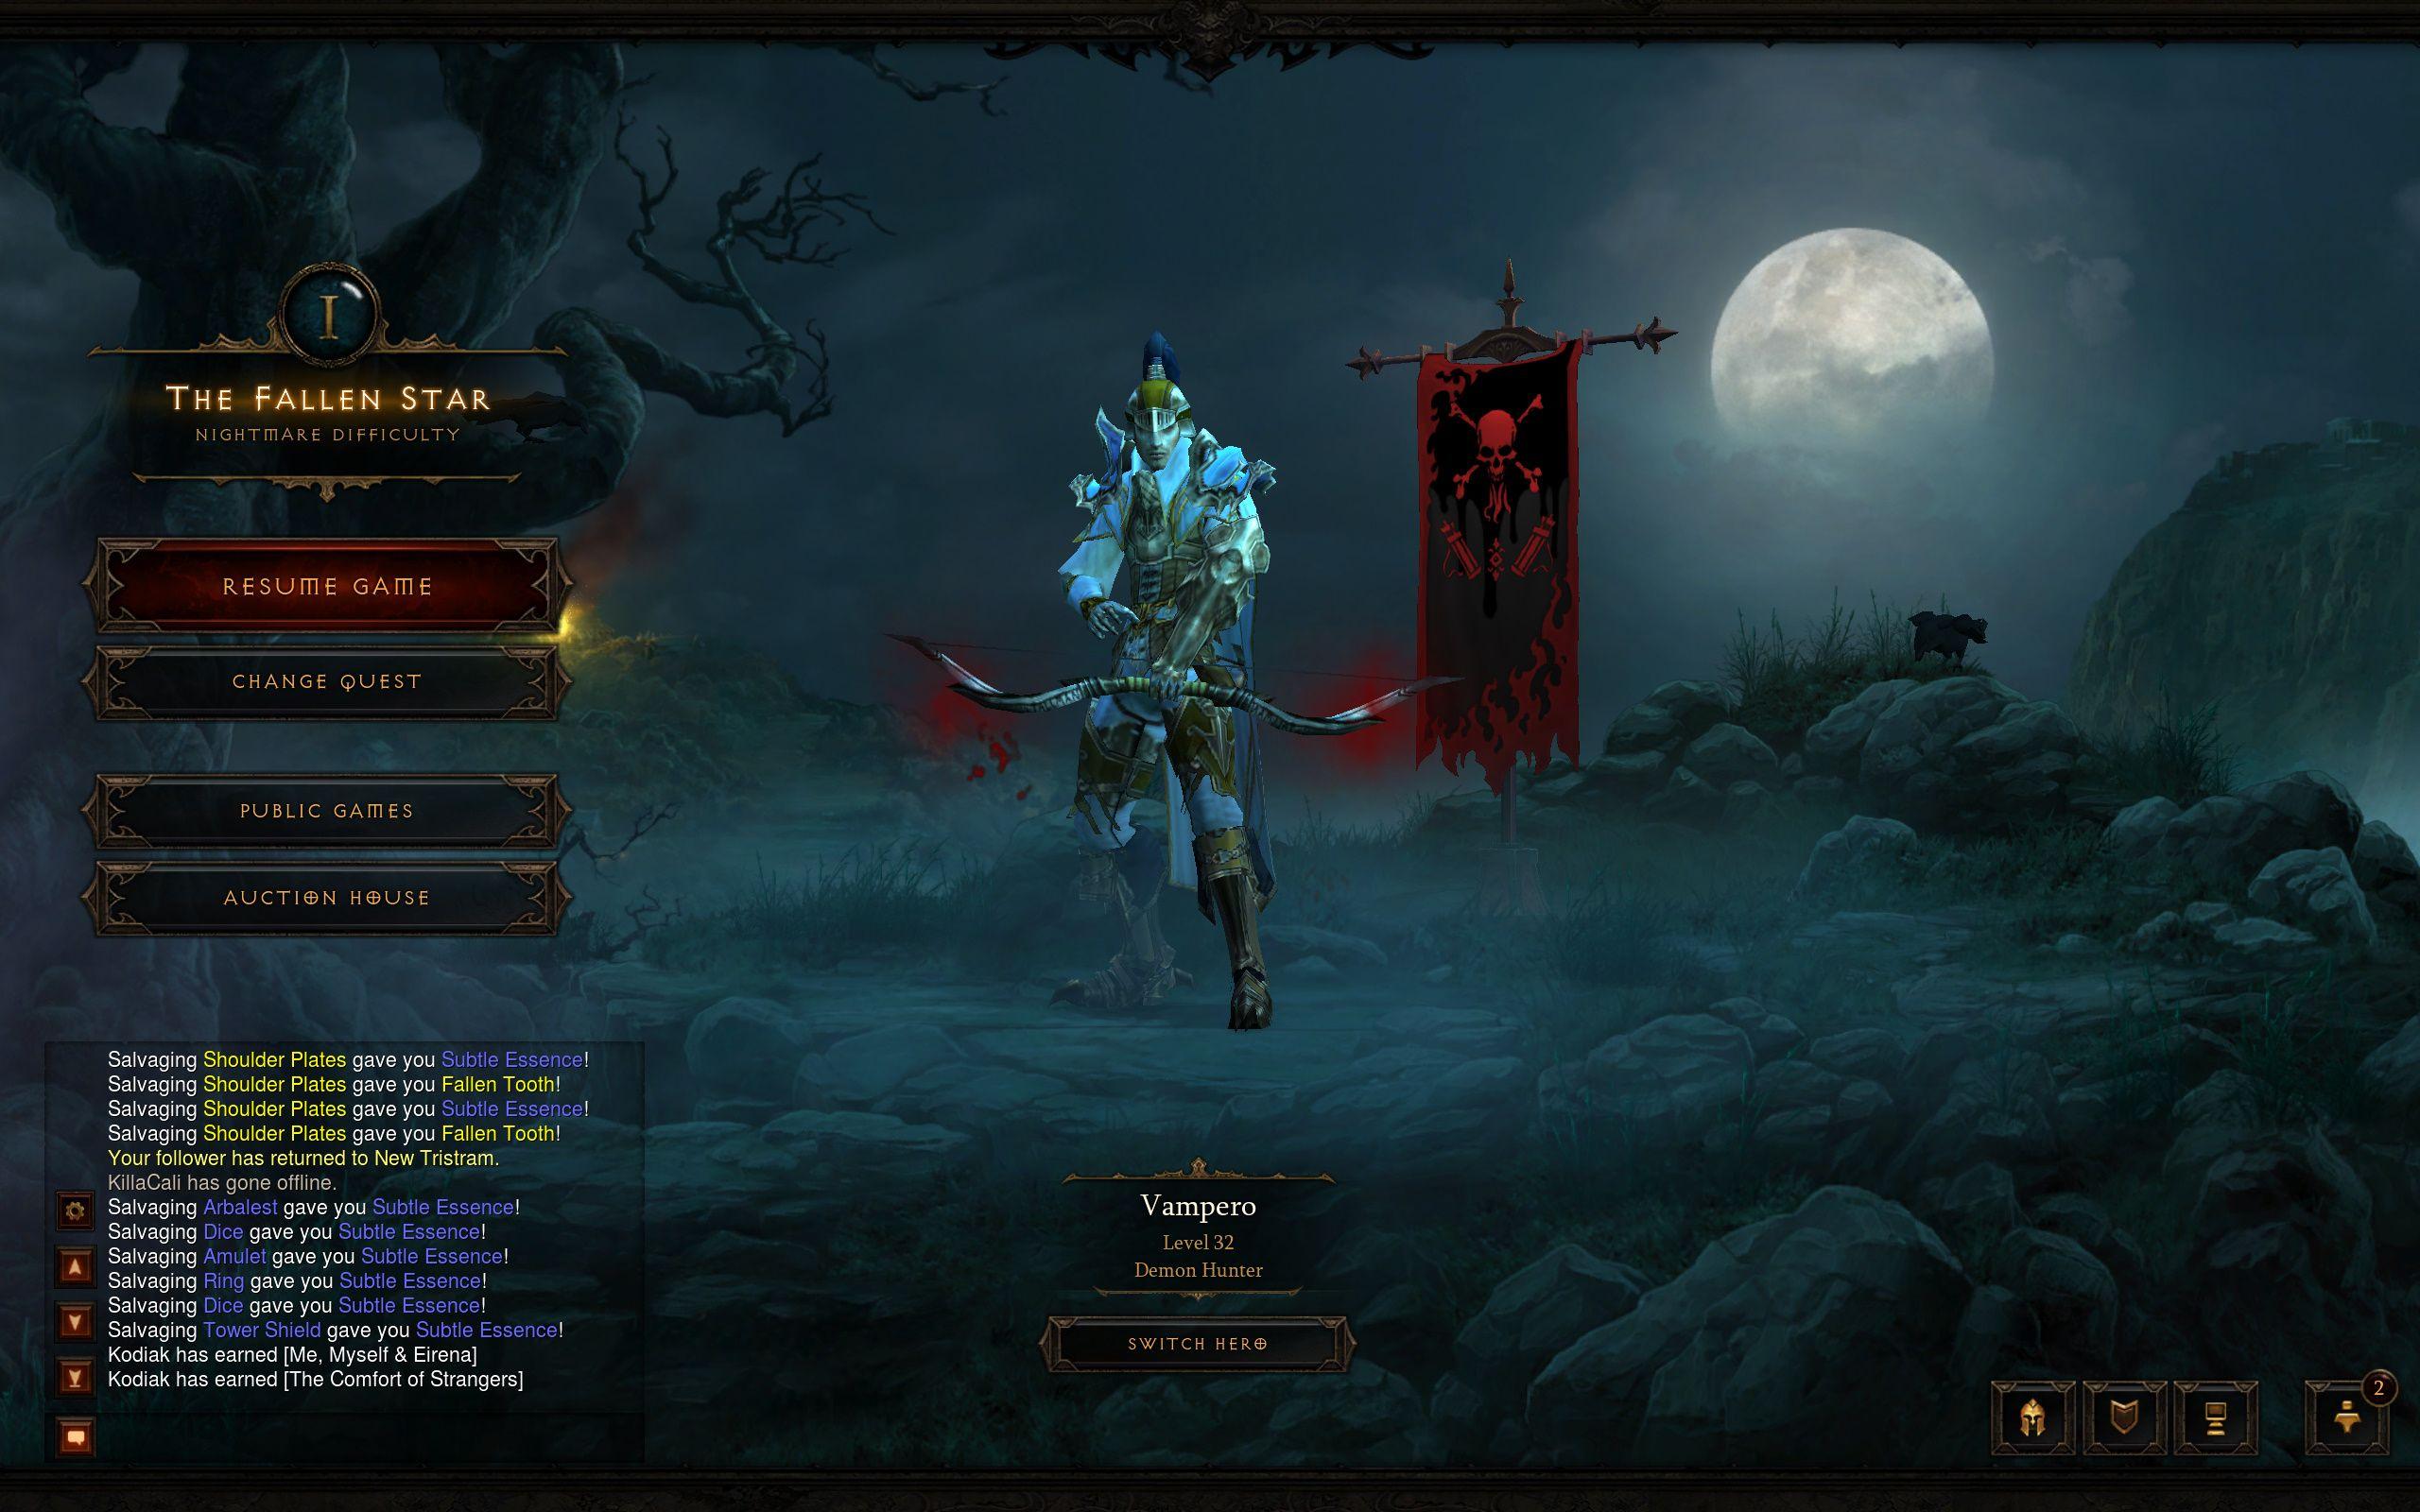 Diablo III NIGHTMARE here I come ! Demon hunter